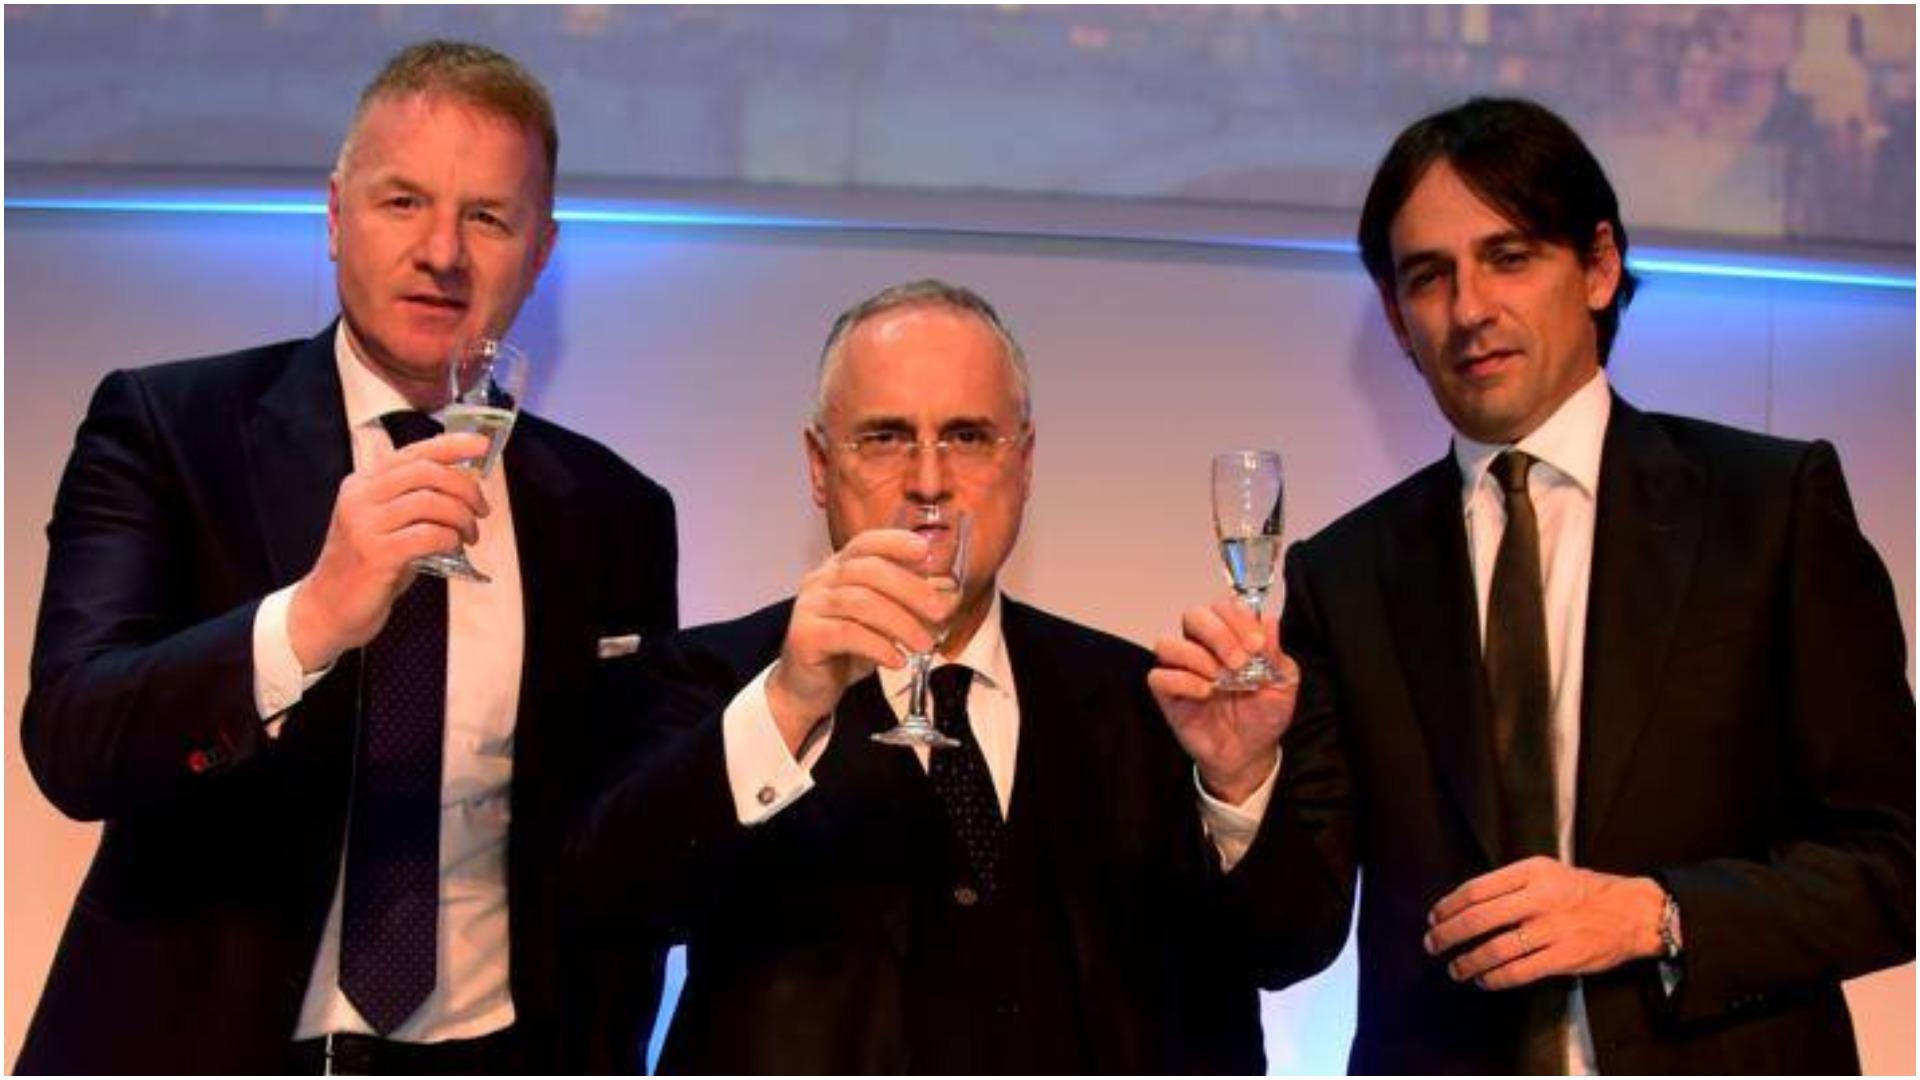 Sa opsione për stolin e Lazios, Lotito: Tare e kishte mbyllur me Inzaghin